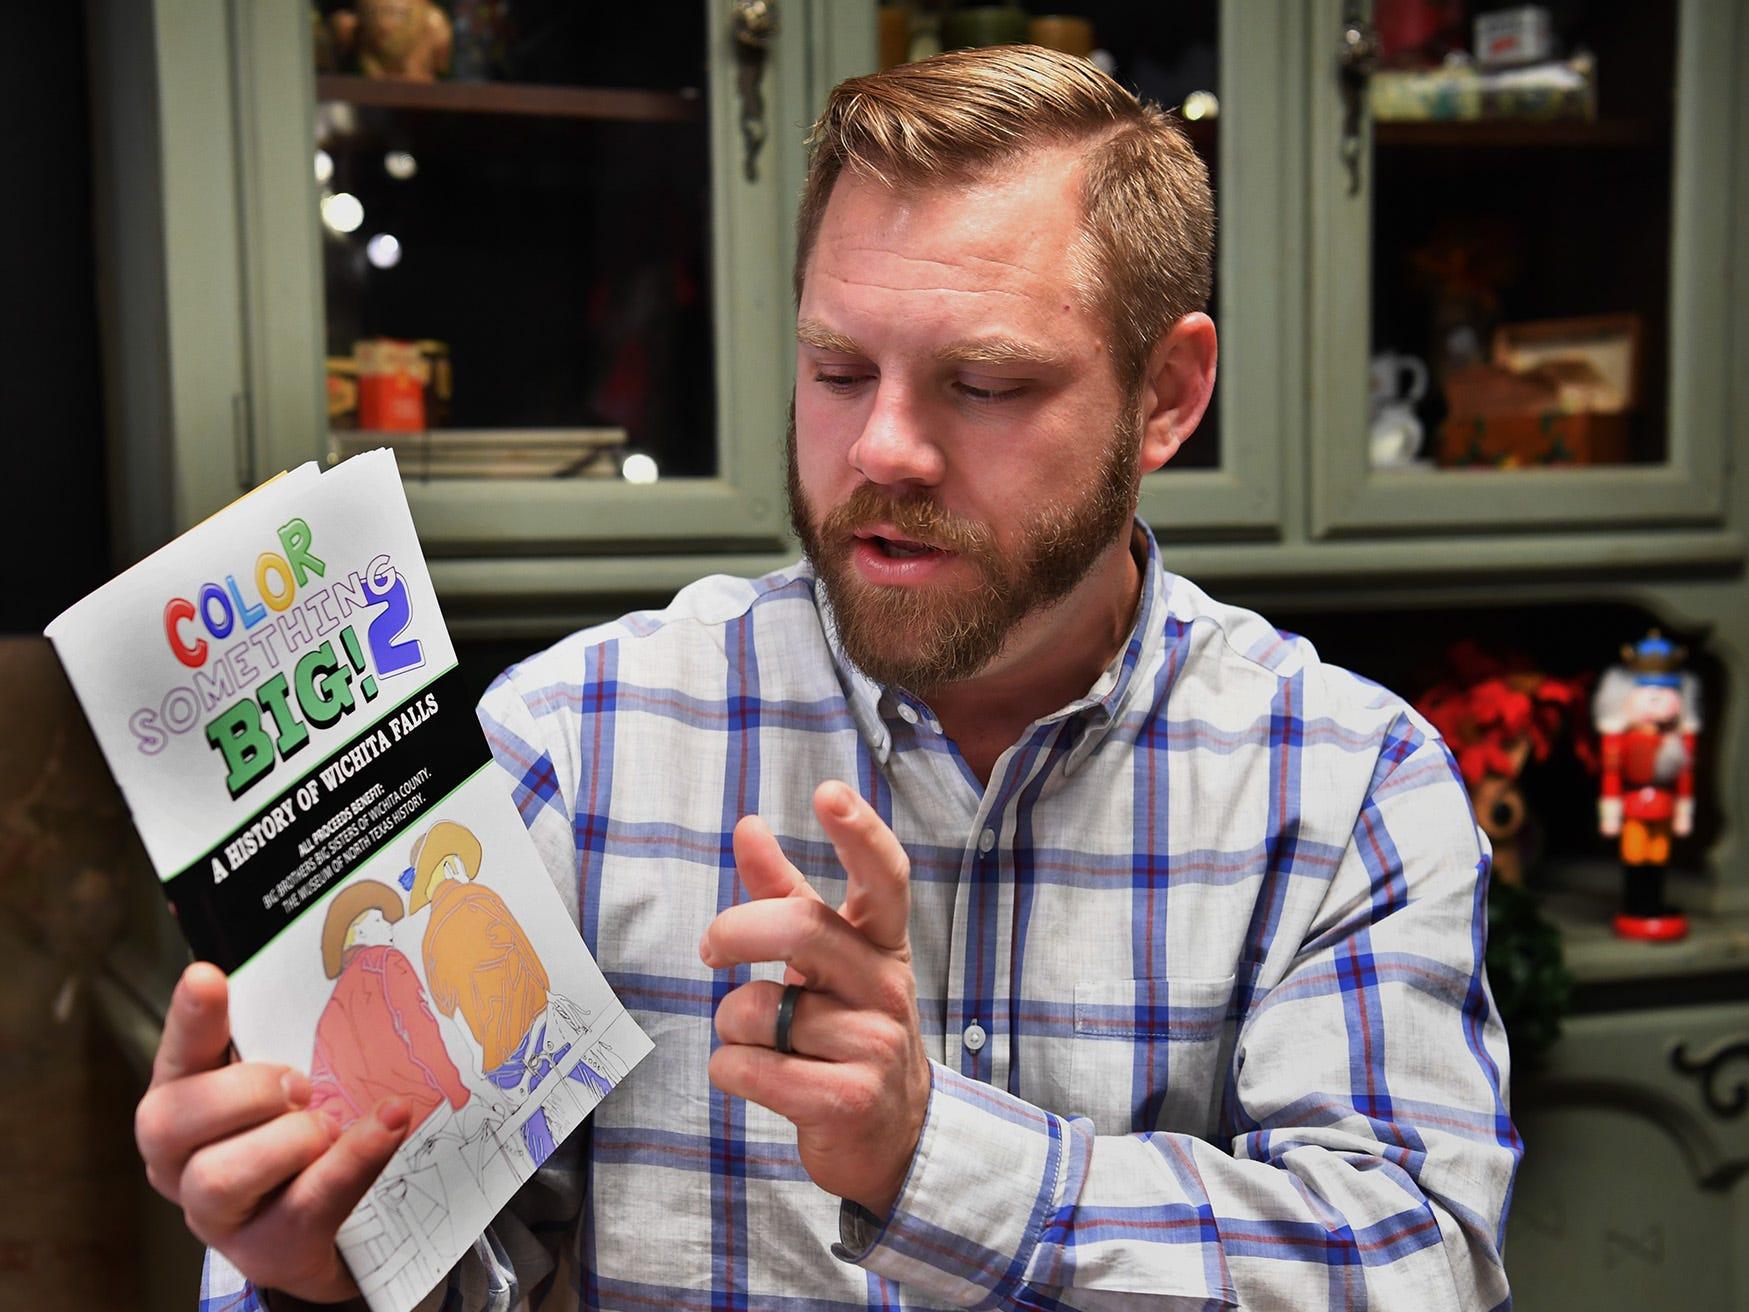 Wichita Falls history coloring book benefits two local nonprofits